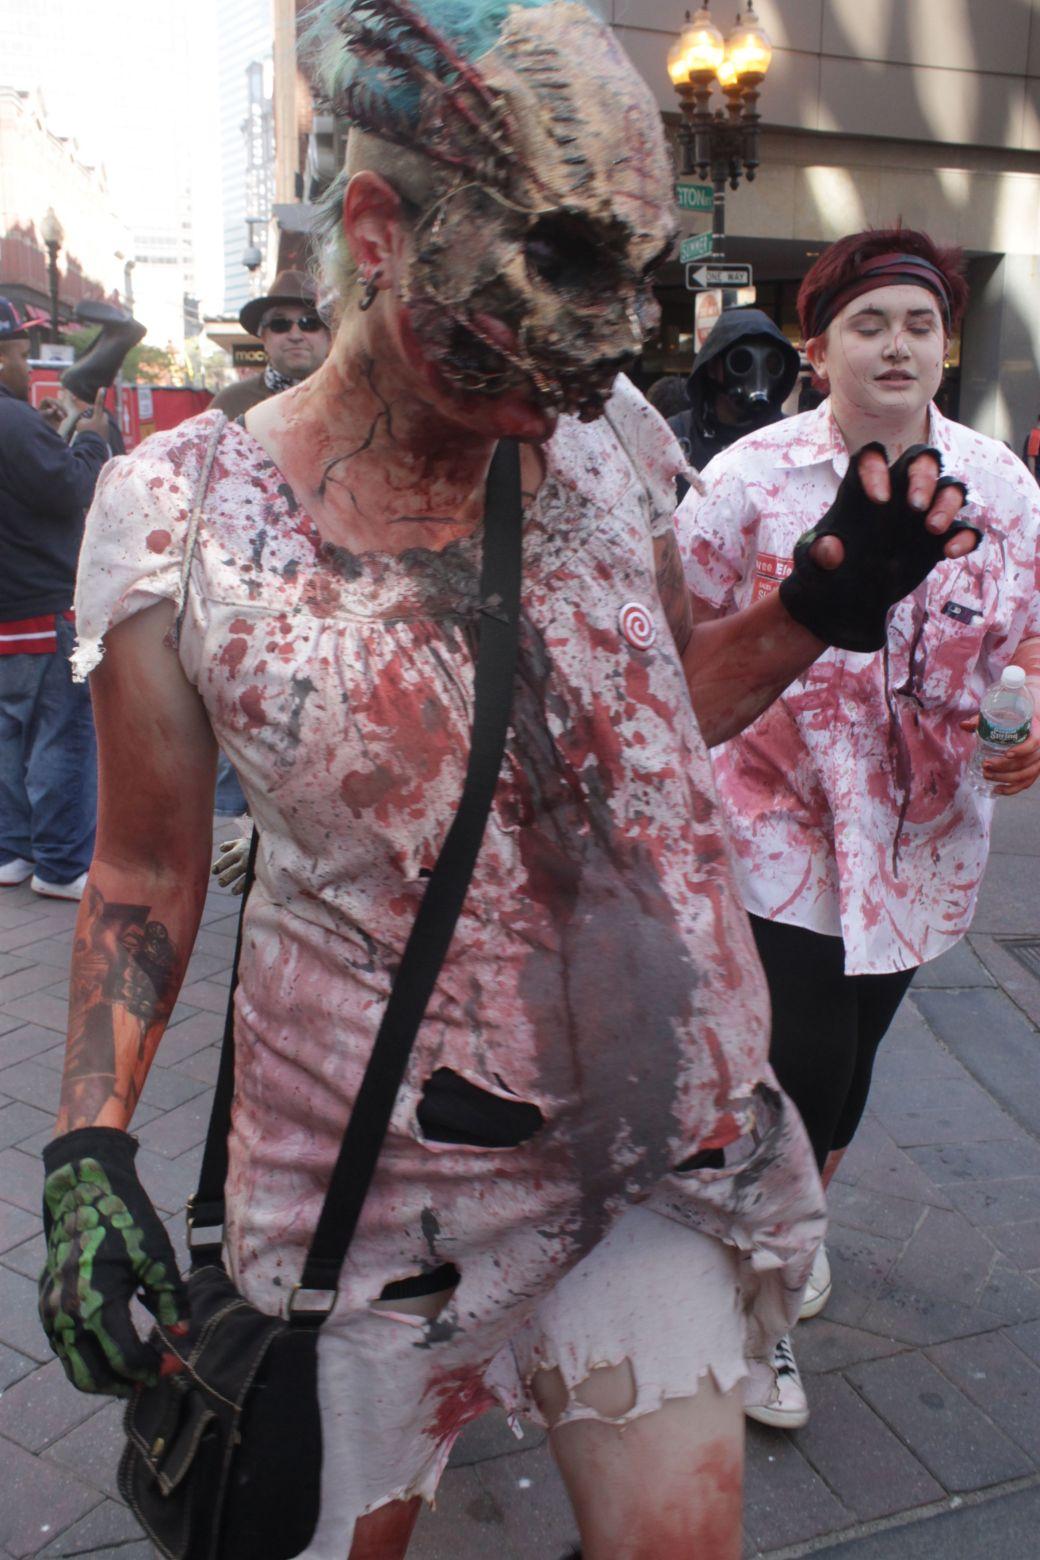 boston zombie walk may 17 13